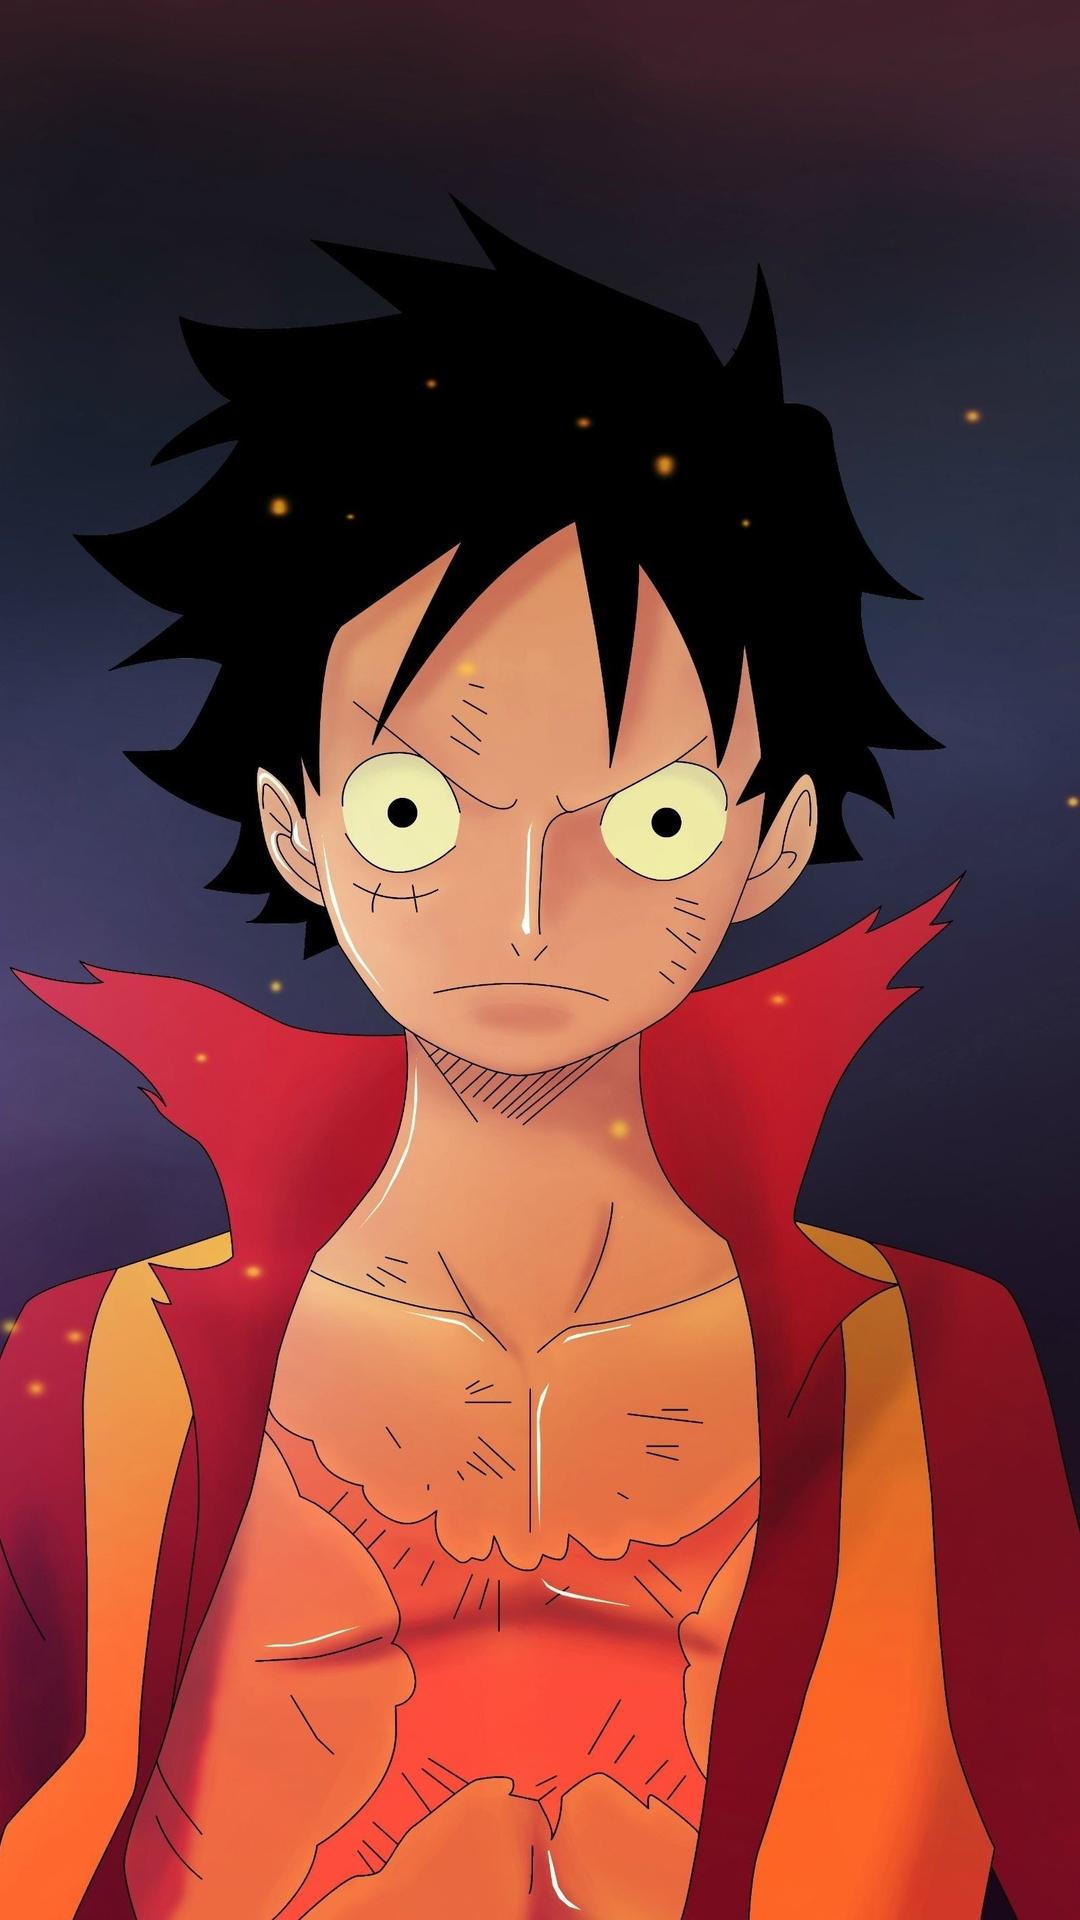 Download 6000 Wallpaper Anime 4k 1080 X 1920  Paling Baru